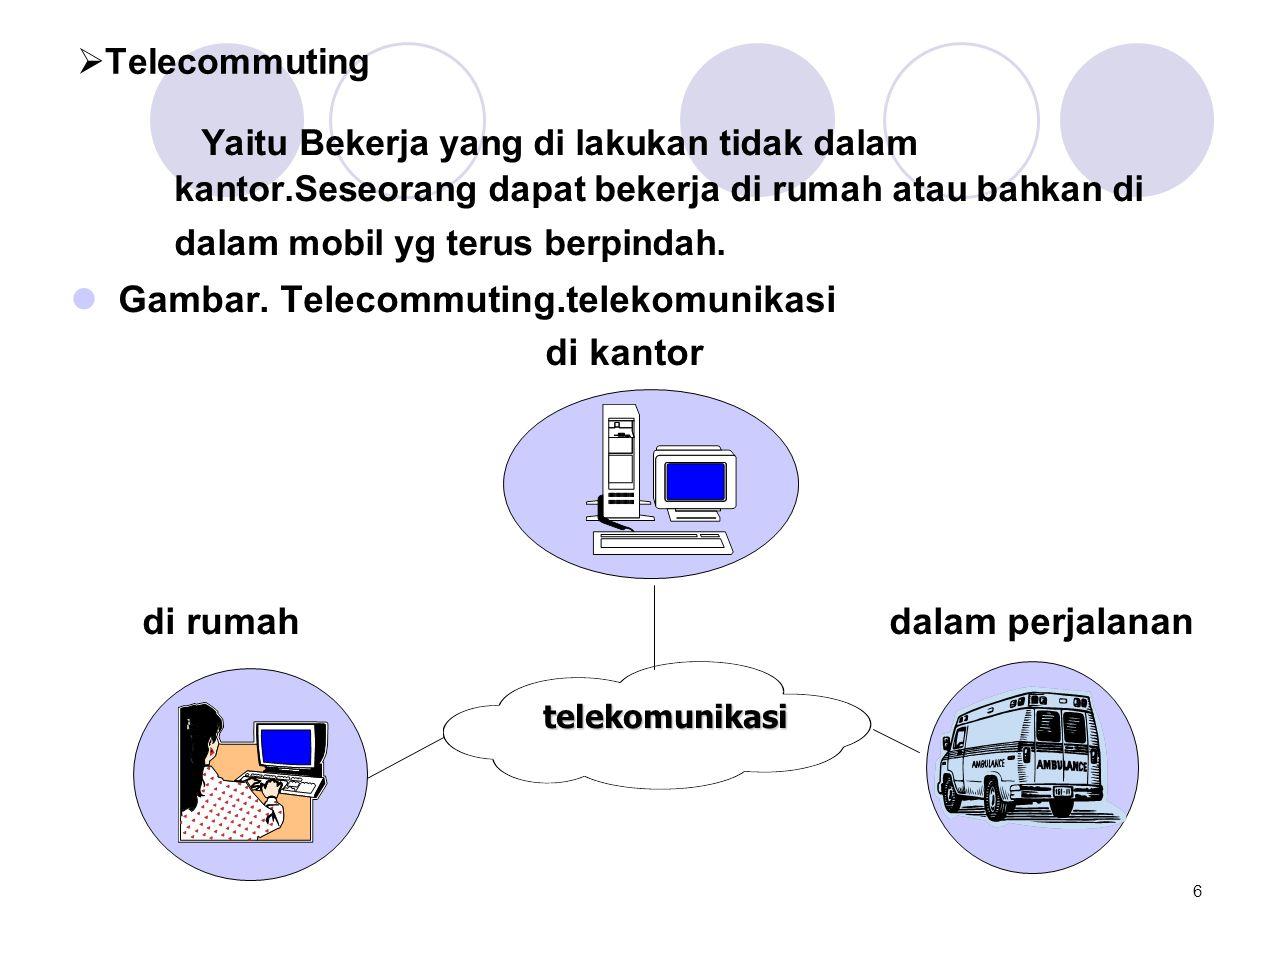  Komputasi Grup Kerja yaitu Grup pekerja yang memakai komputer yang terhubung dalam jaringan untuk berdiskusi dan menyelesaikan suatu masalah.hal seperti ini mudah di realisasikan dengan bantuan perangkat lunak yg di namakan Groupware (misalnya lotus notes dan ms net meeting.